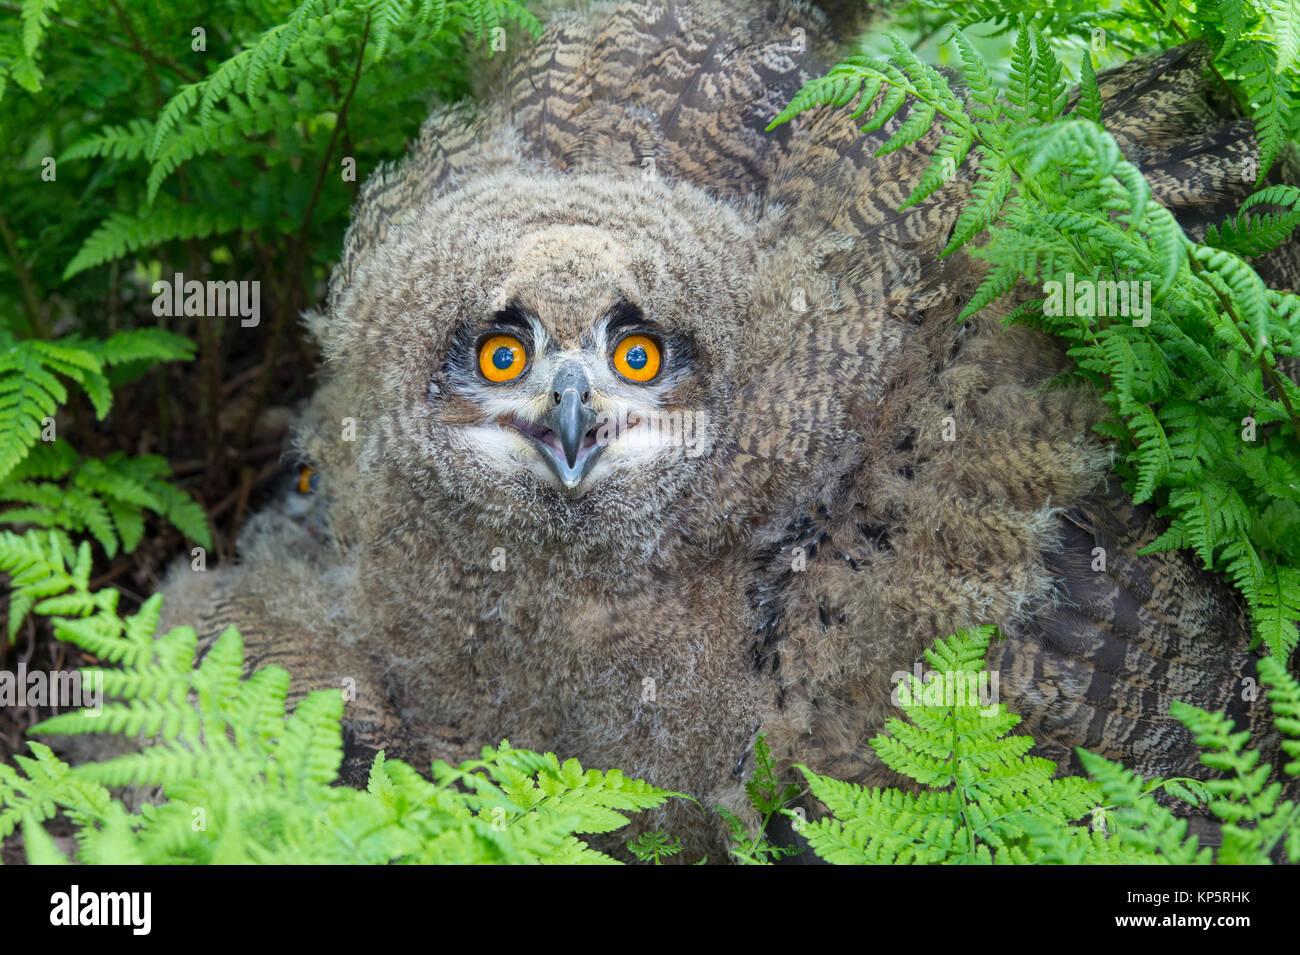 Junger Uhu, young Eurasian Eagle-Owl, Bubo bubo - Stock Image